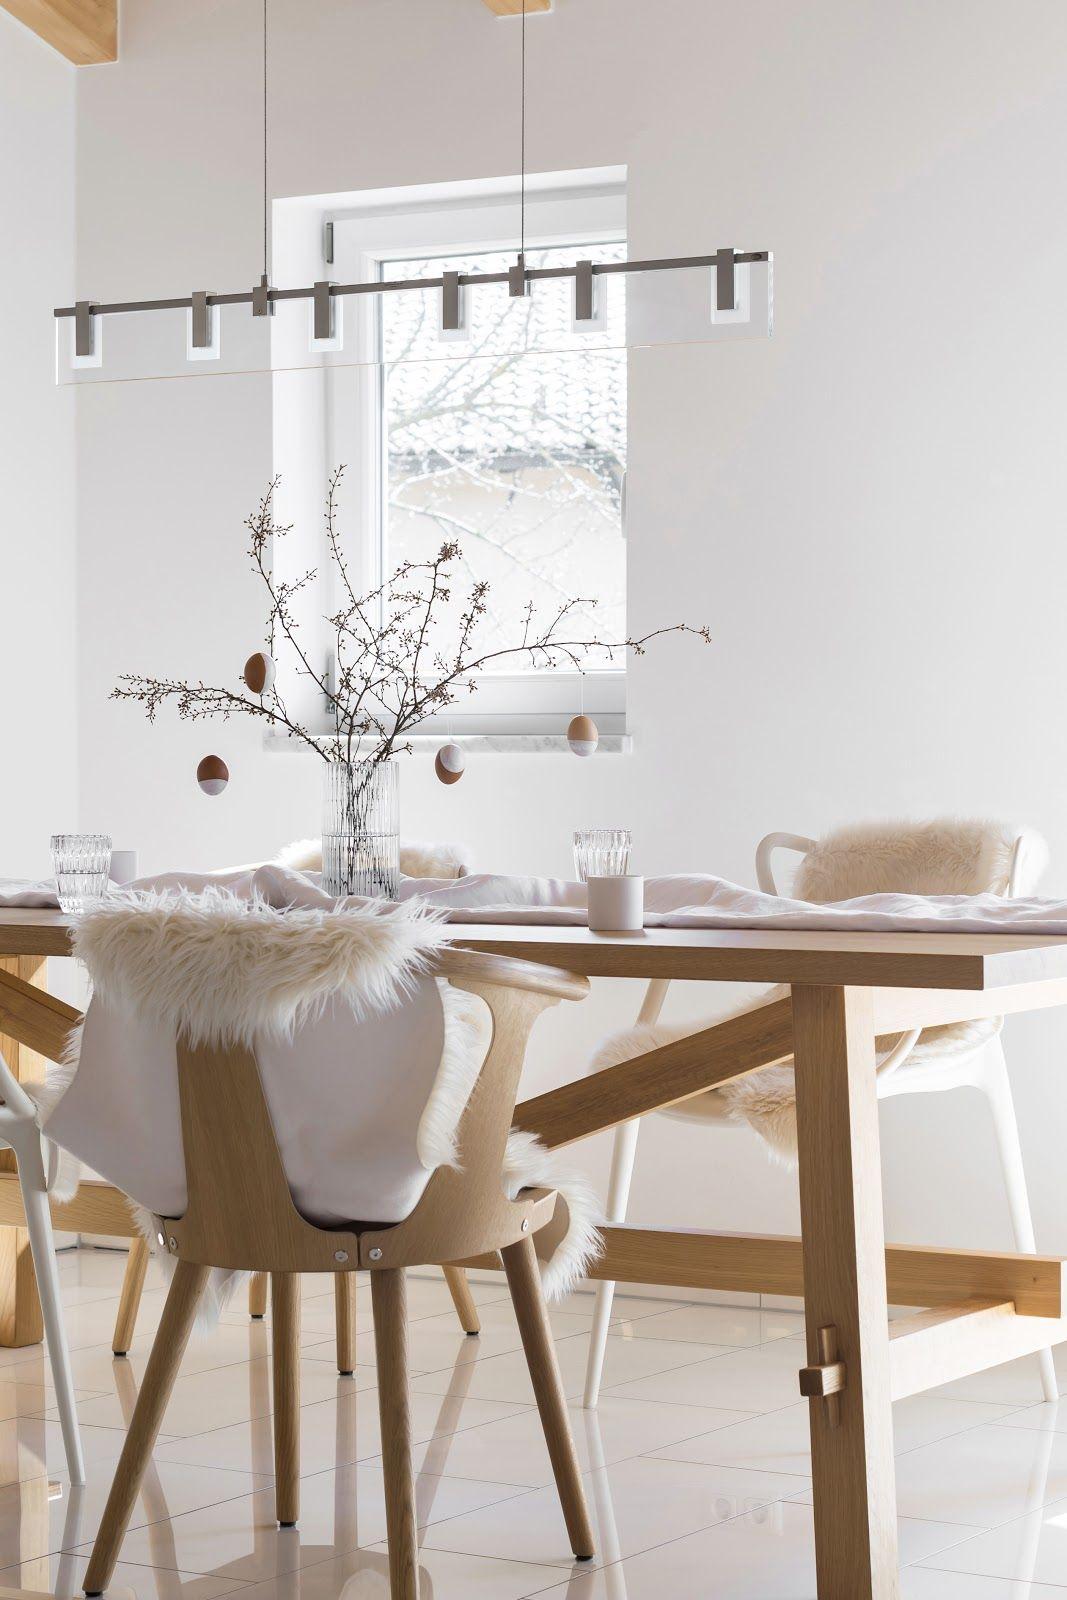 DIY | MINIMALISTISCHE OSTEREIER #easter #easteregg #diy #minimalsm #diningroom #interior #decoration #inspiration #wood #easterdiy #scandinavian #interiordesign #selbermachen #purist #nordicinspo #inspohome #homedecor